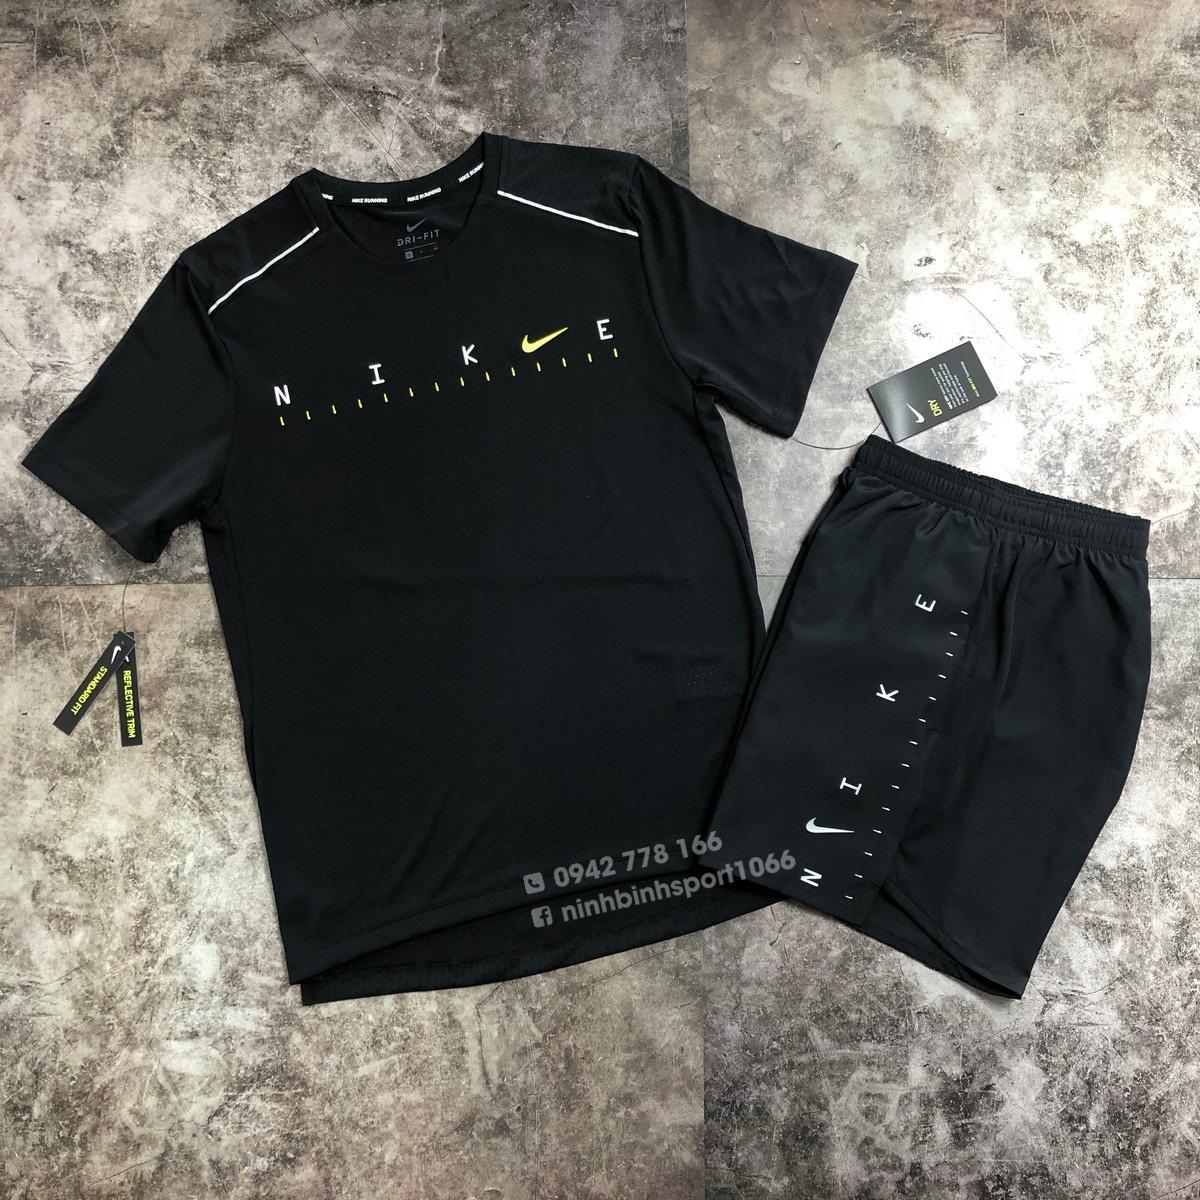 Áo thể thao nam Nike Dri-FIT Miler Future Fast CJ6484-010